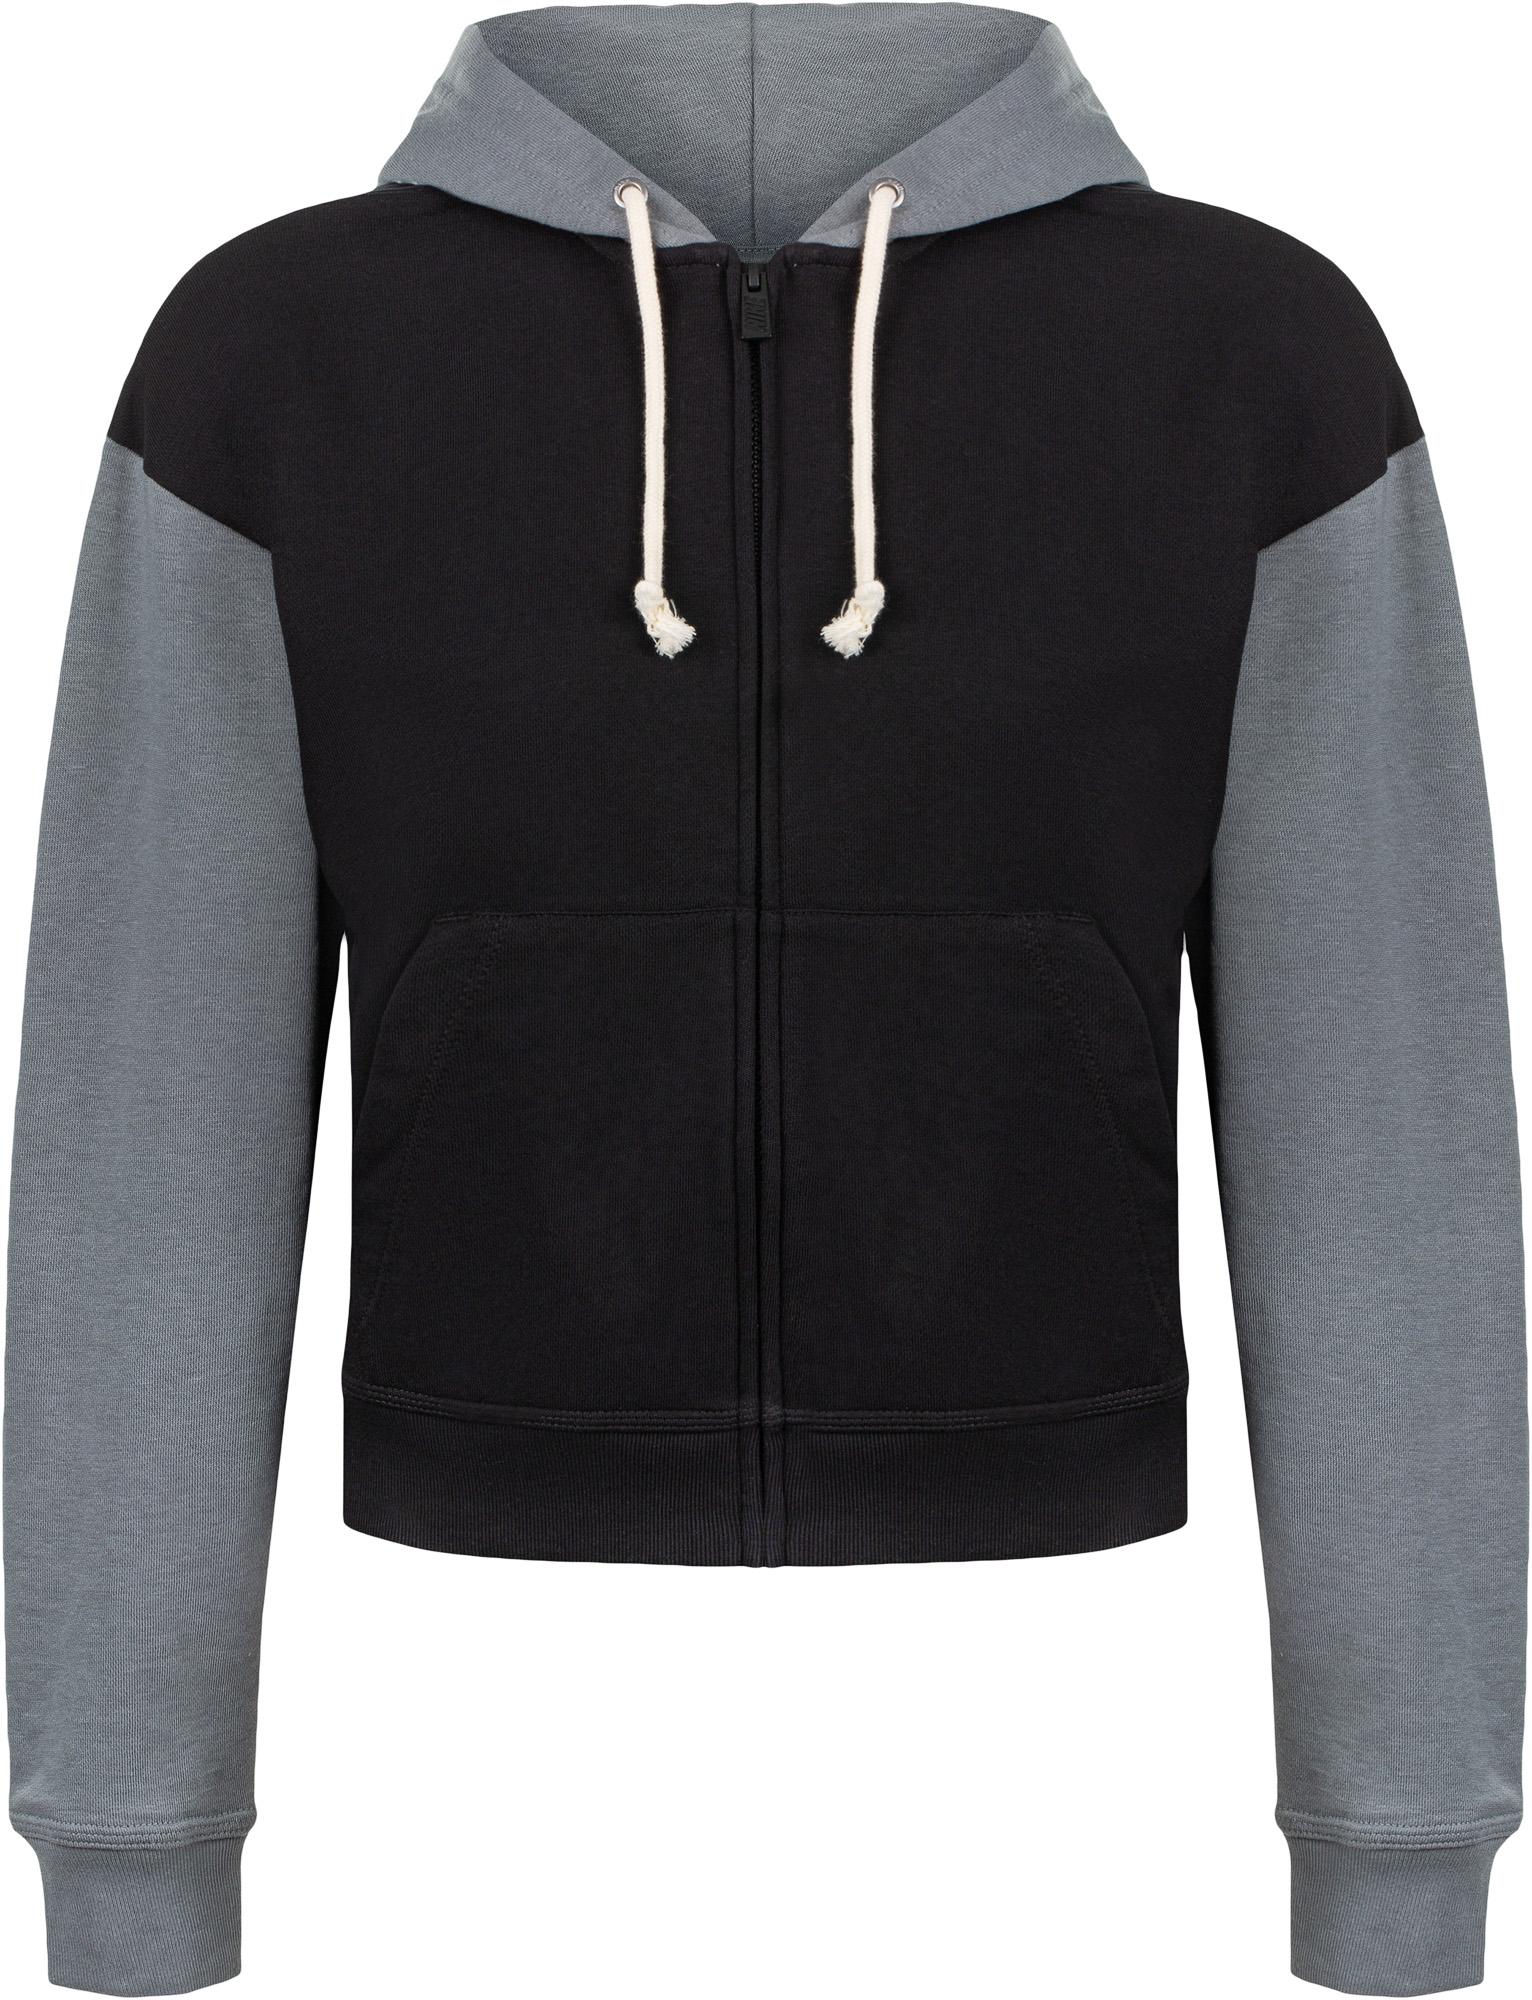 Nike Толстовка женская Nike Sportswear Varsity, размер 50-52